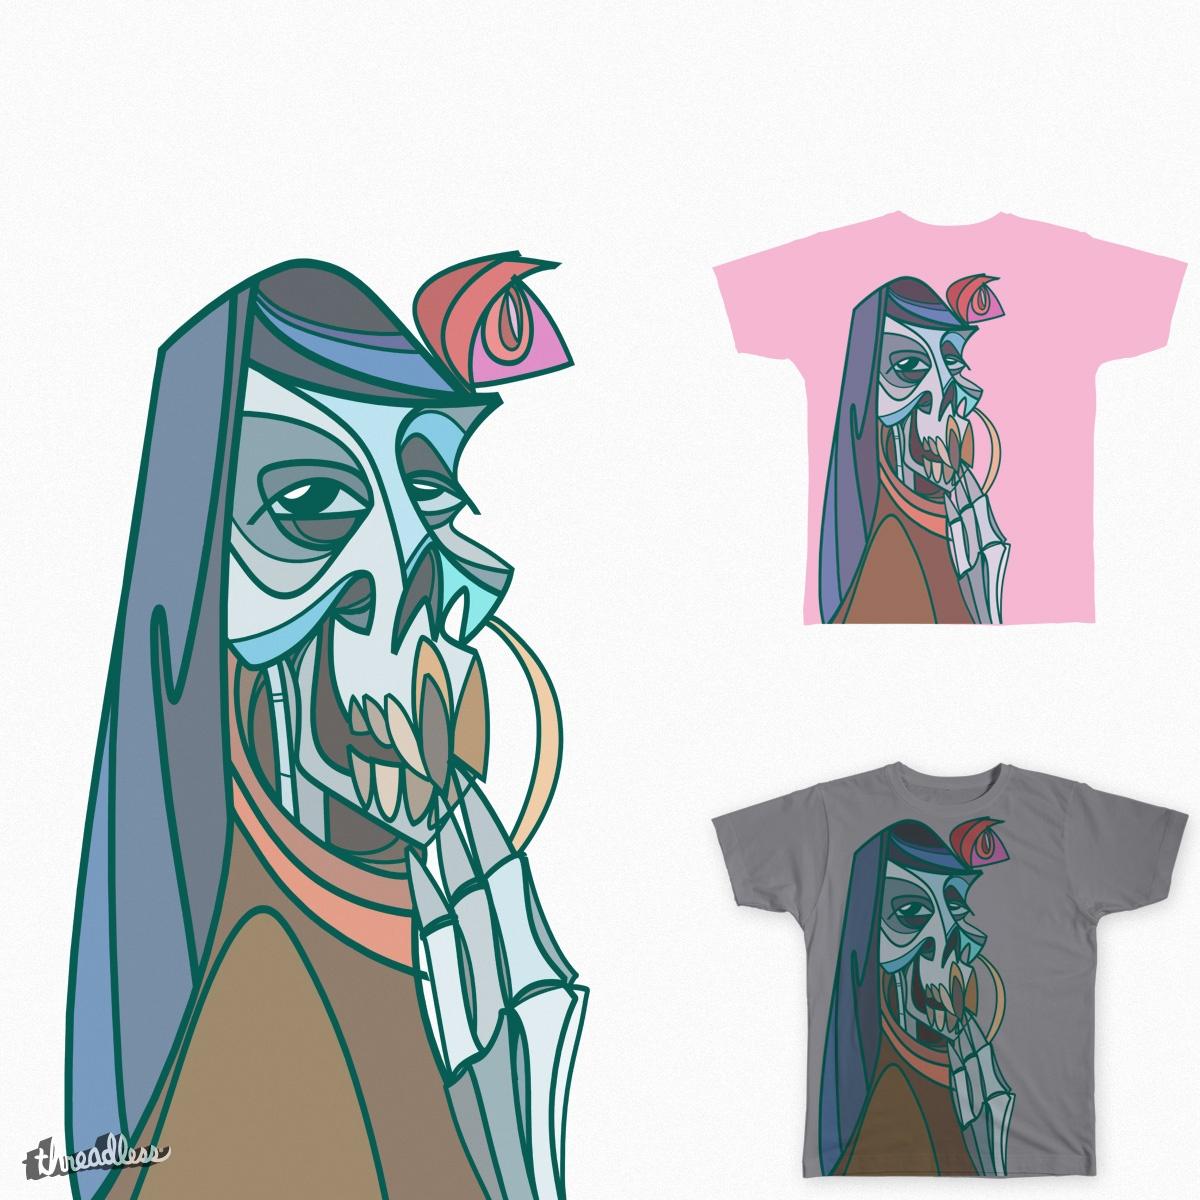 La LLorona skeleto by fingas.porvida on Threadless